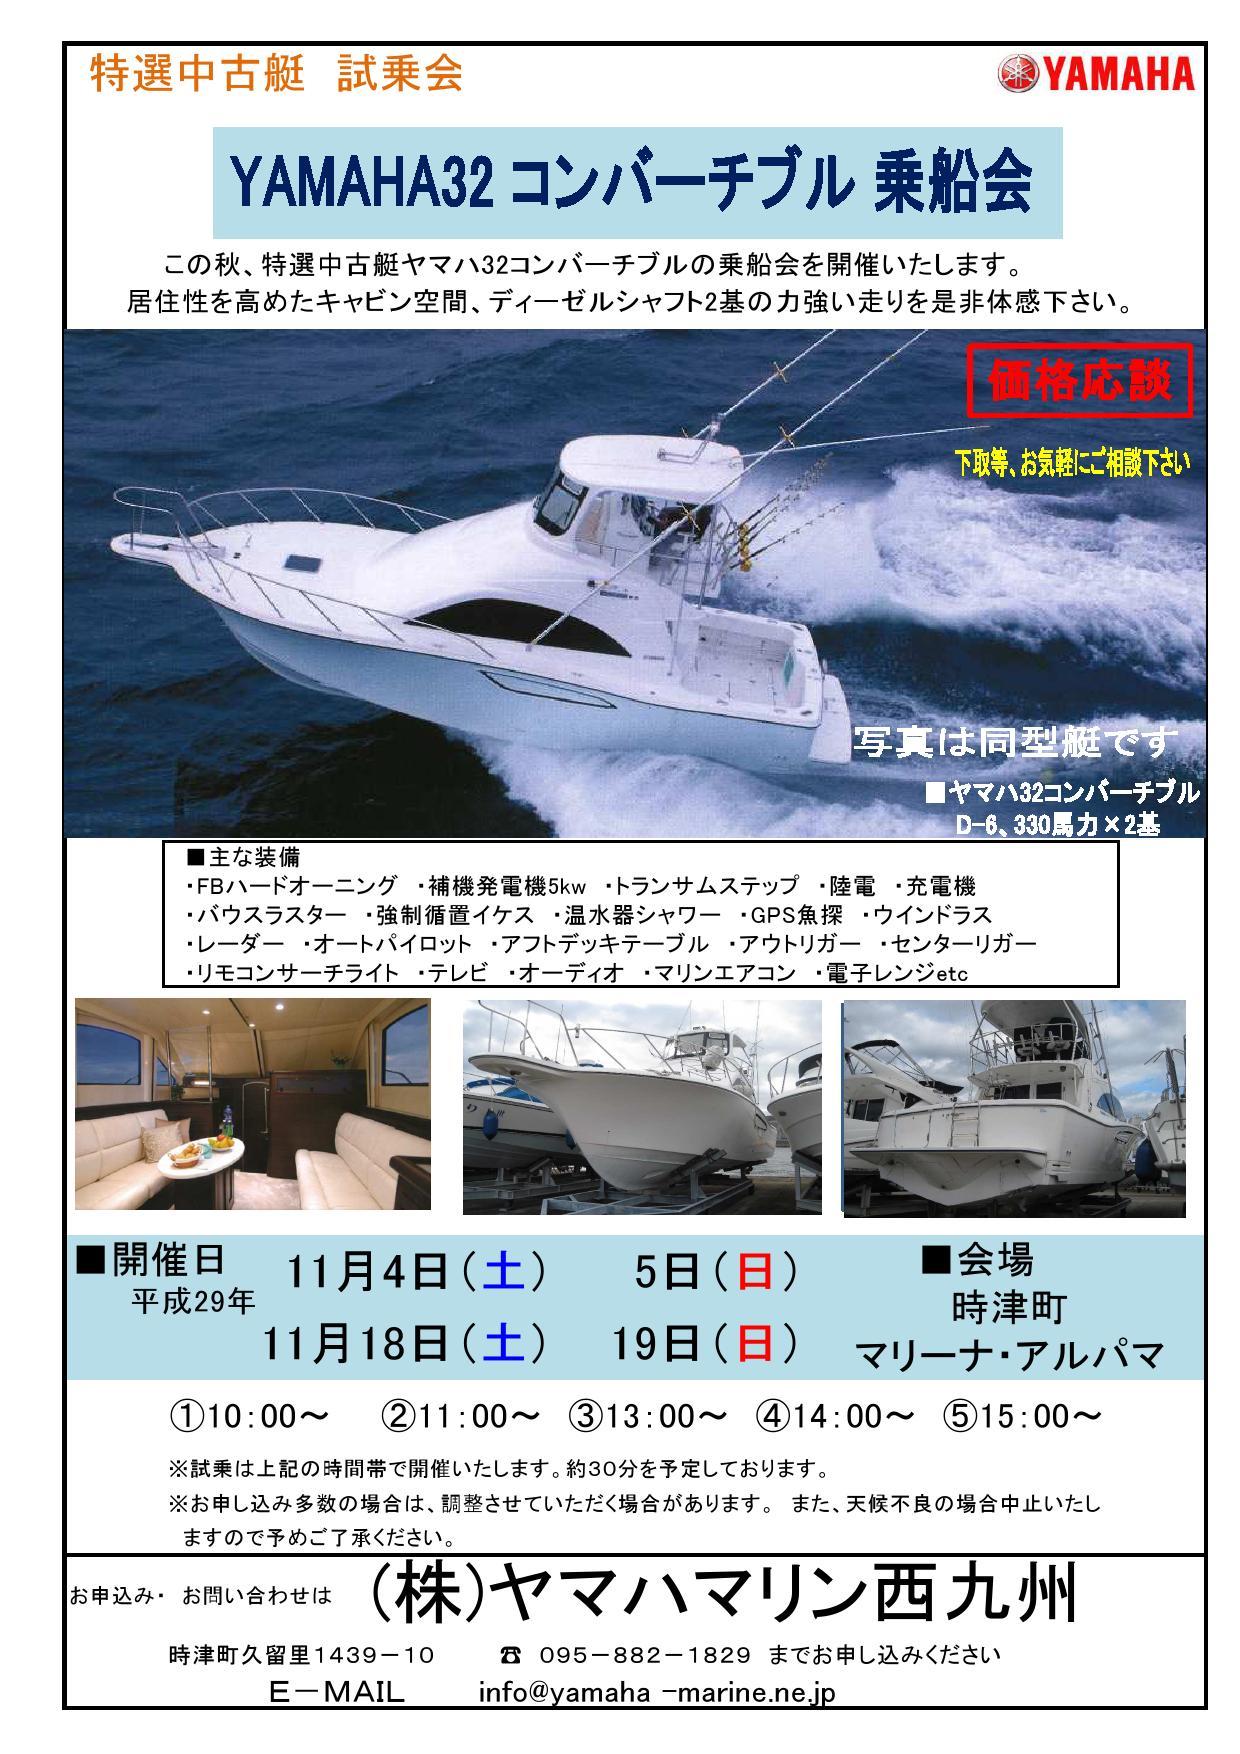 YAMAHA32コンバーチブル 乗船会 開催